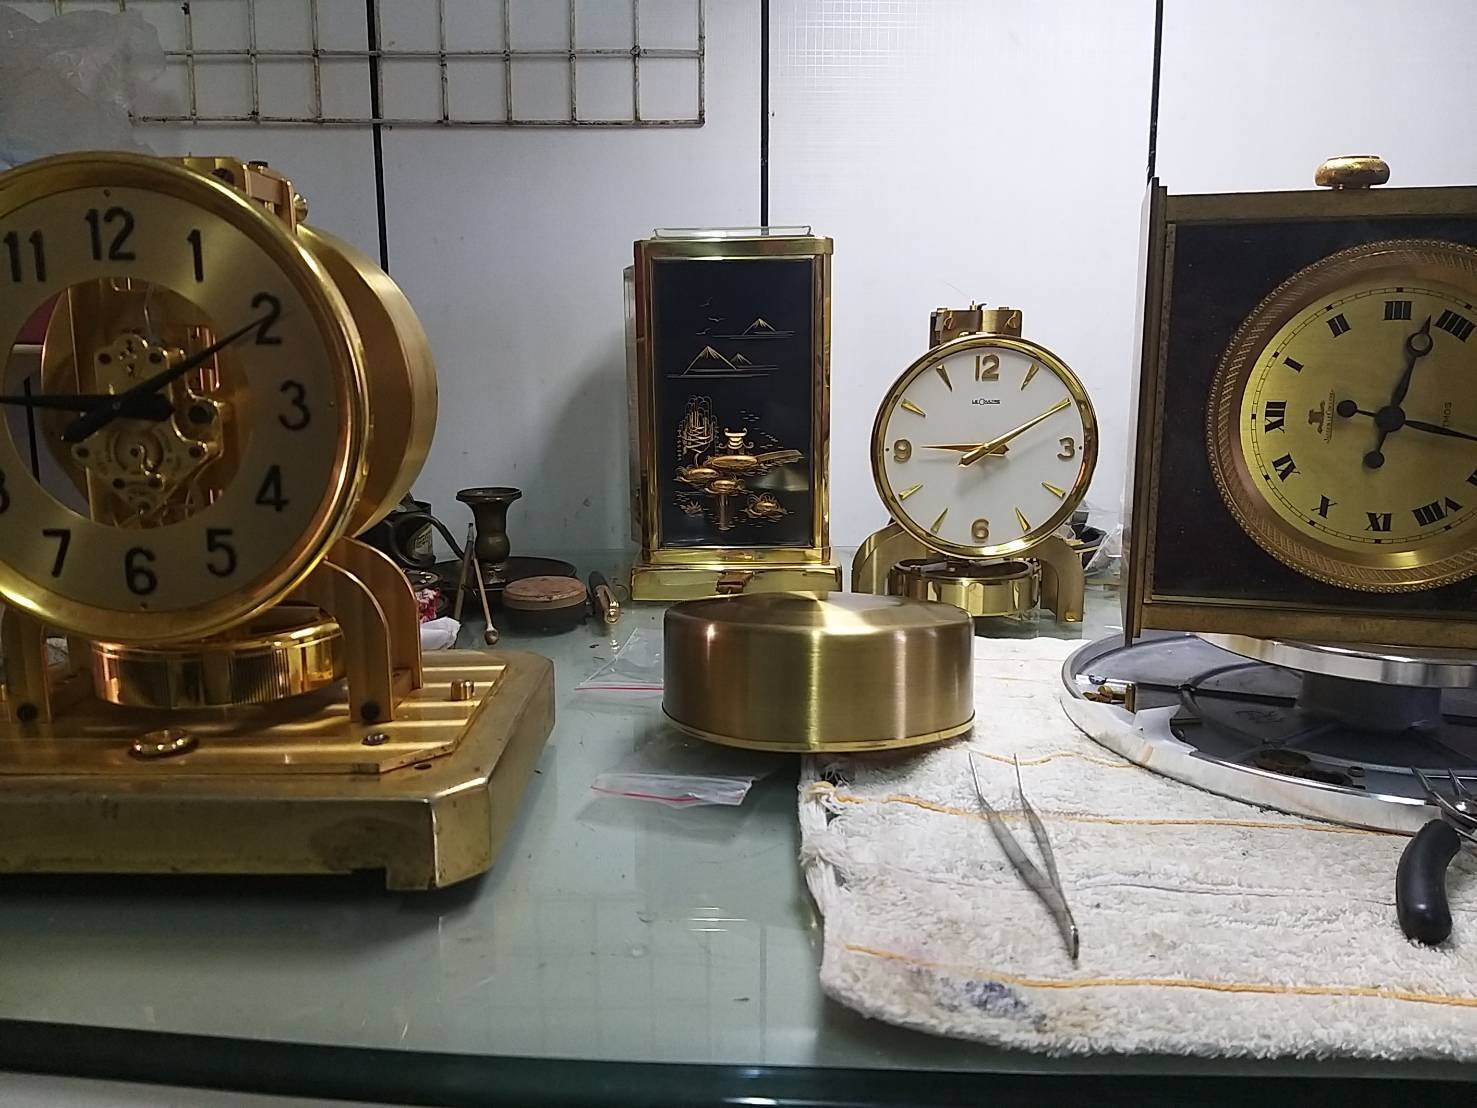 ATMOS 瑞士空氣鐘 400日鐘保養 修理 機械鐘維修